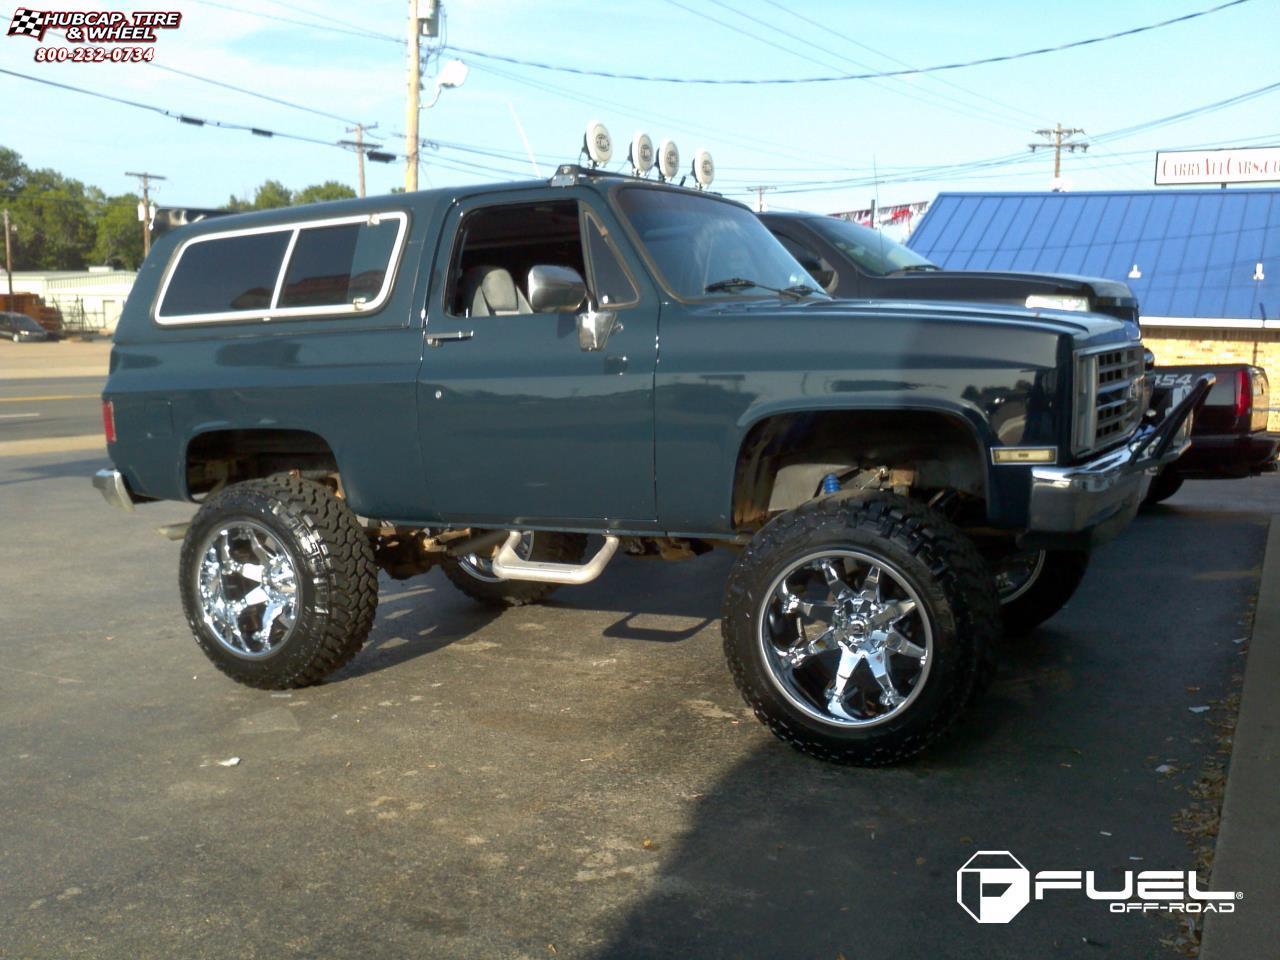 Chevrolet Blazer Fuel Octane D508 Wheels Chrome